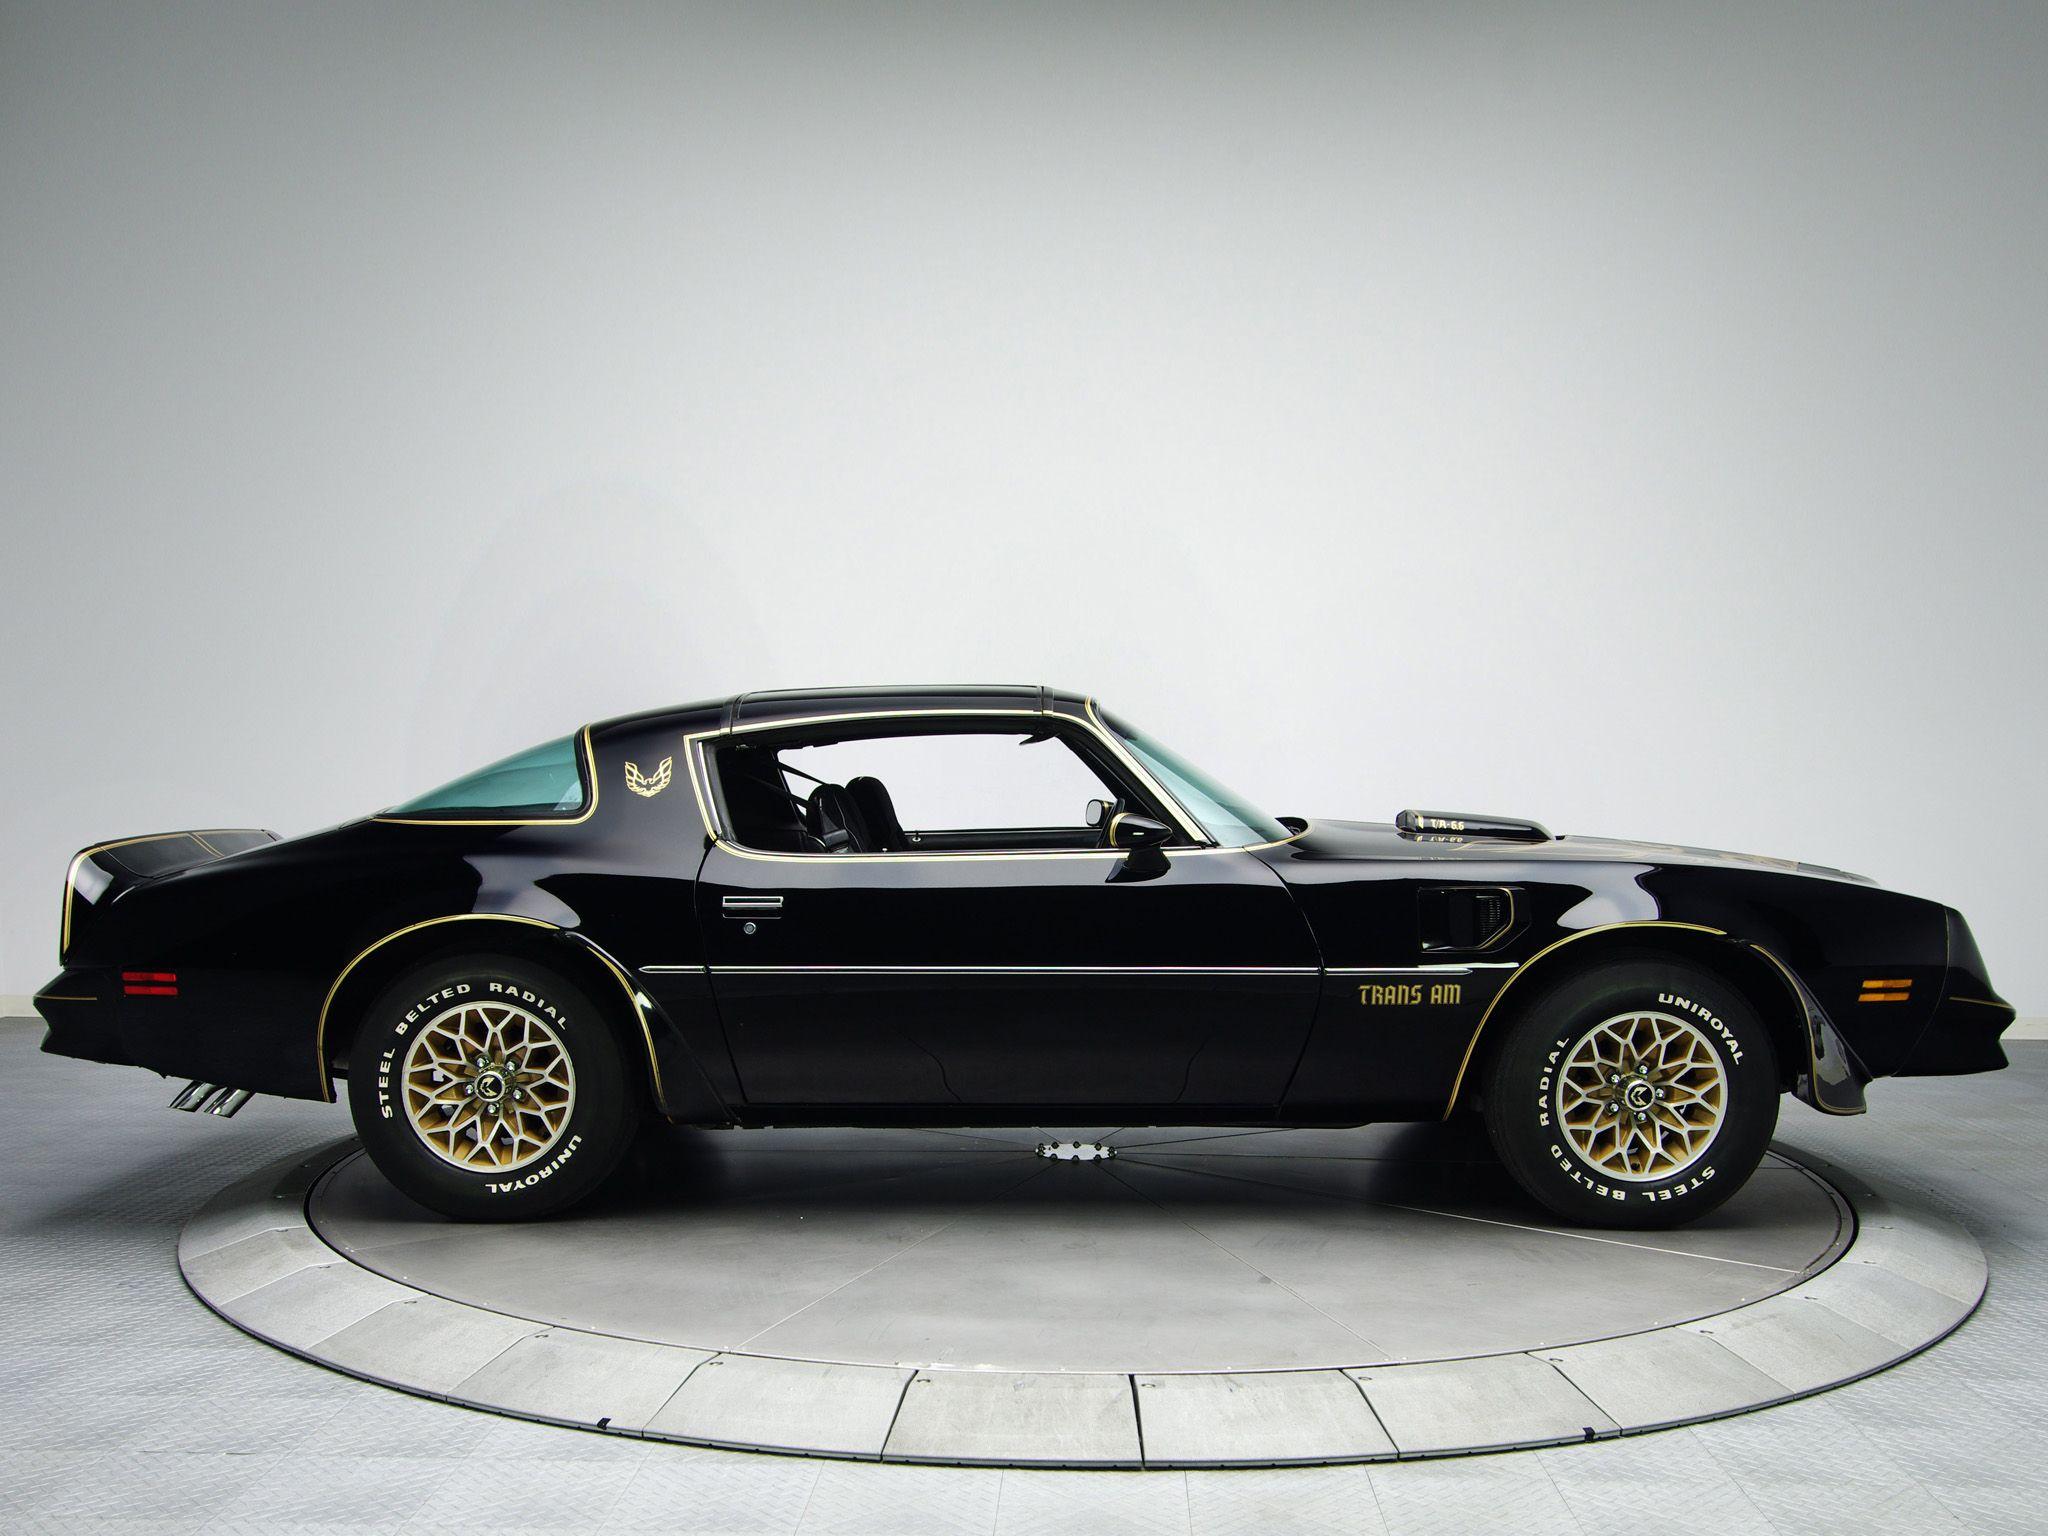 1978 pontiac trans am black s e special edition black paint with gold